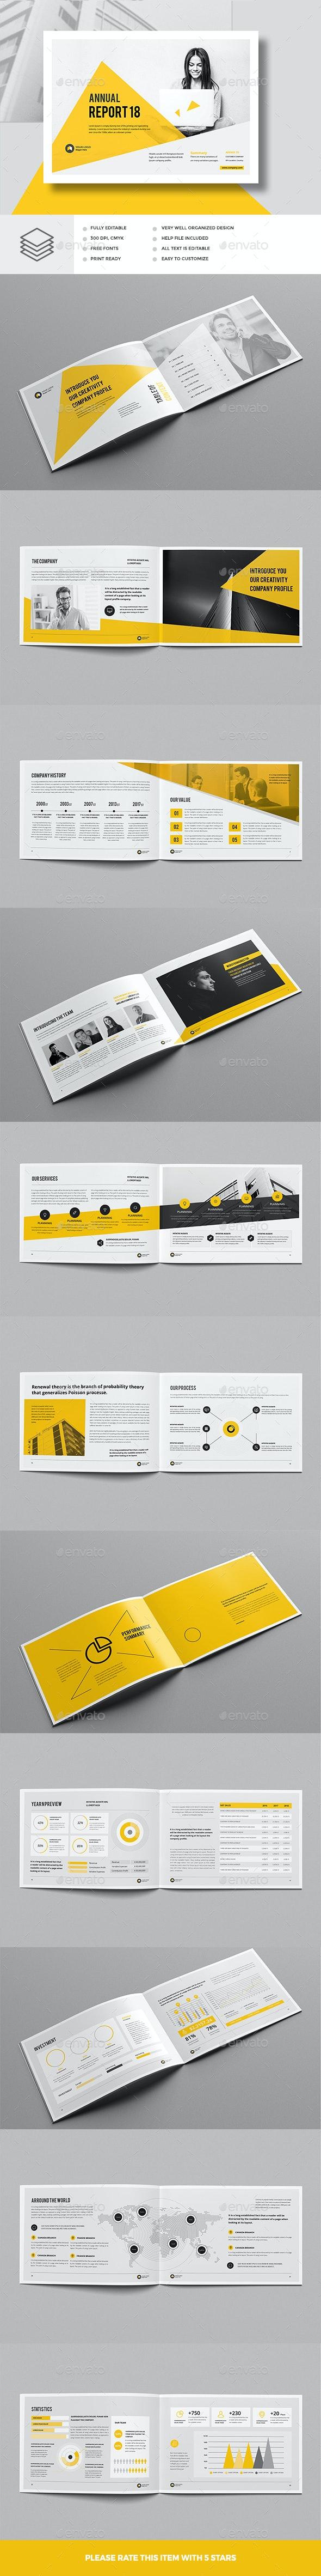 Annual Report Template A4 Landscape - Corporate Brochures